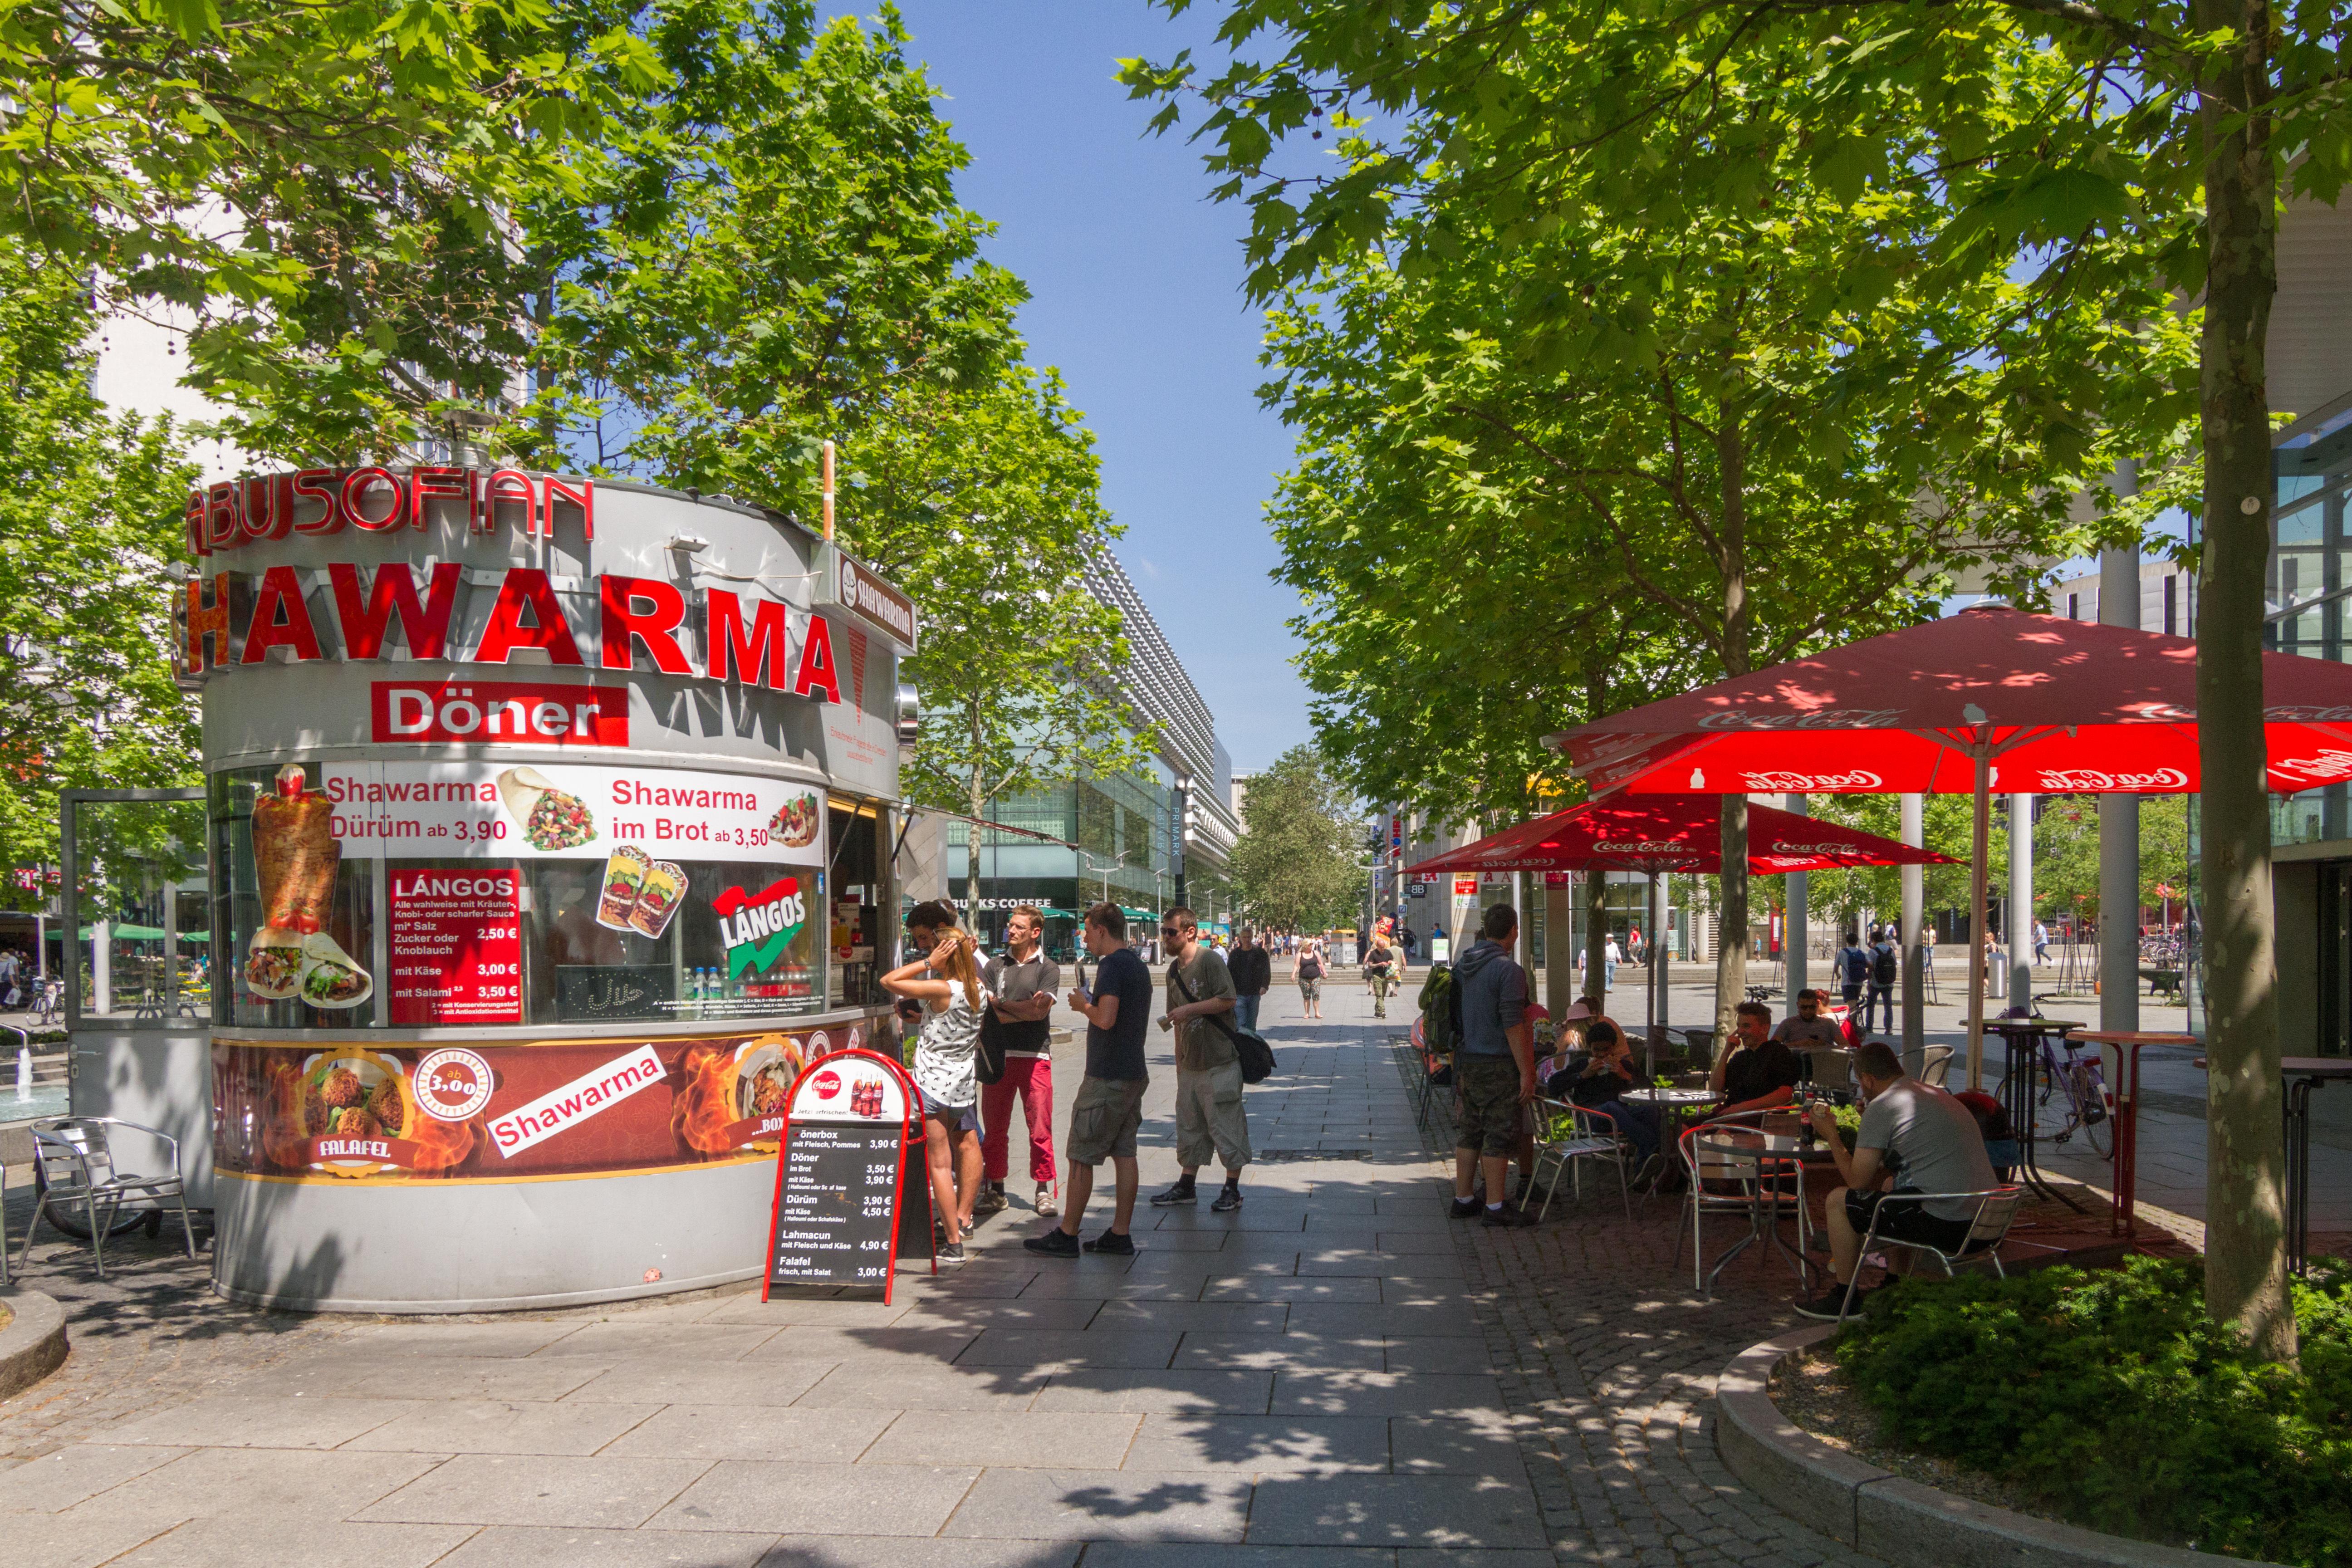 2017-06-02 Shawarma on Prager Straße, Dresden.jpg